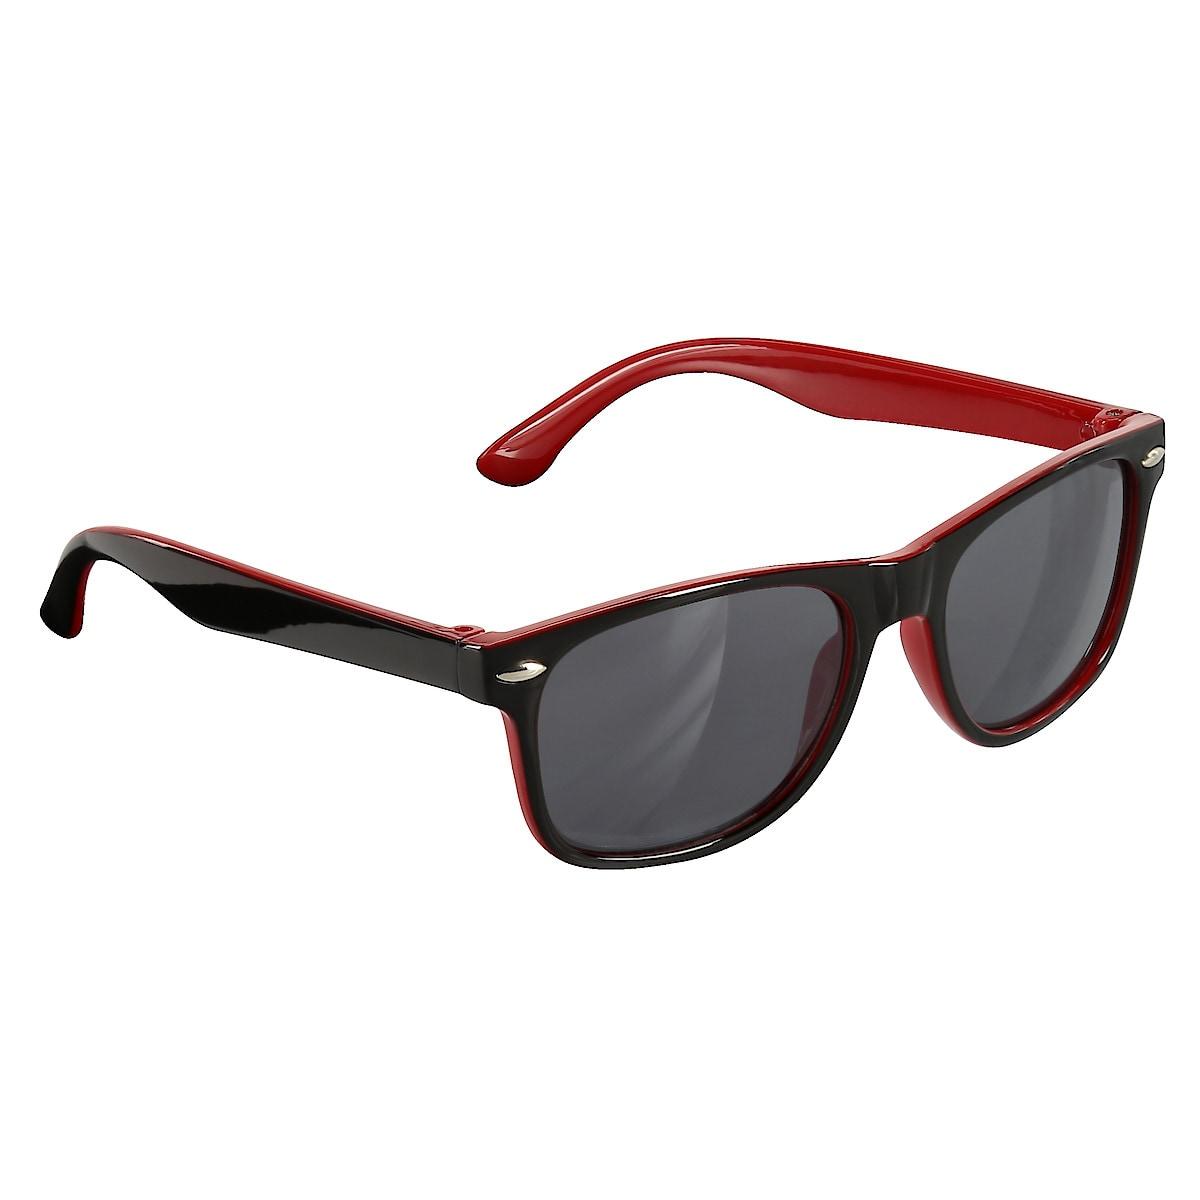 Solglasögon för barn